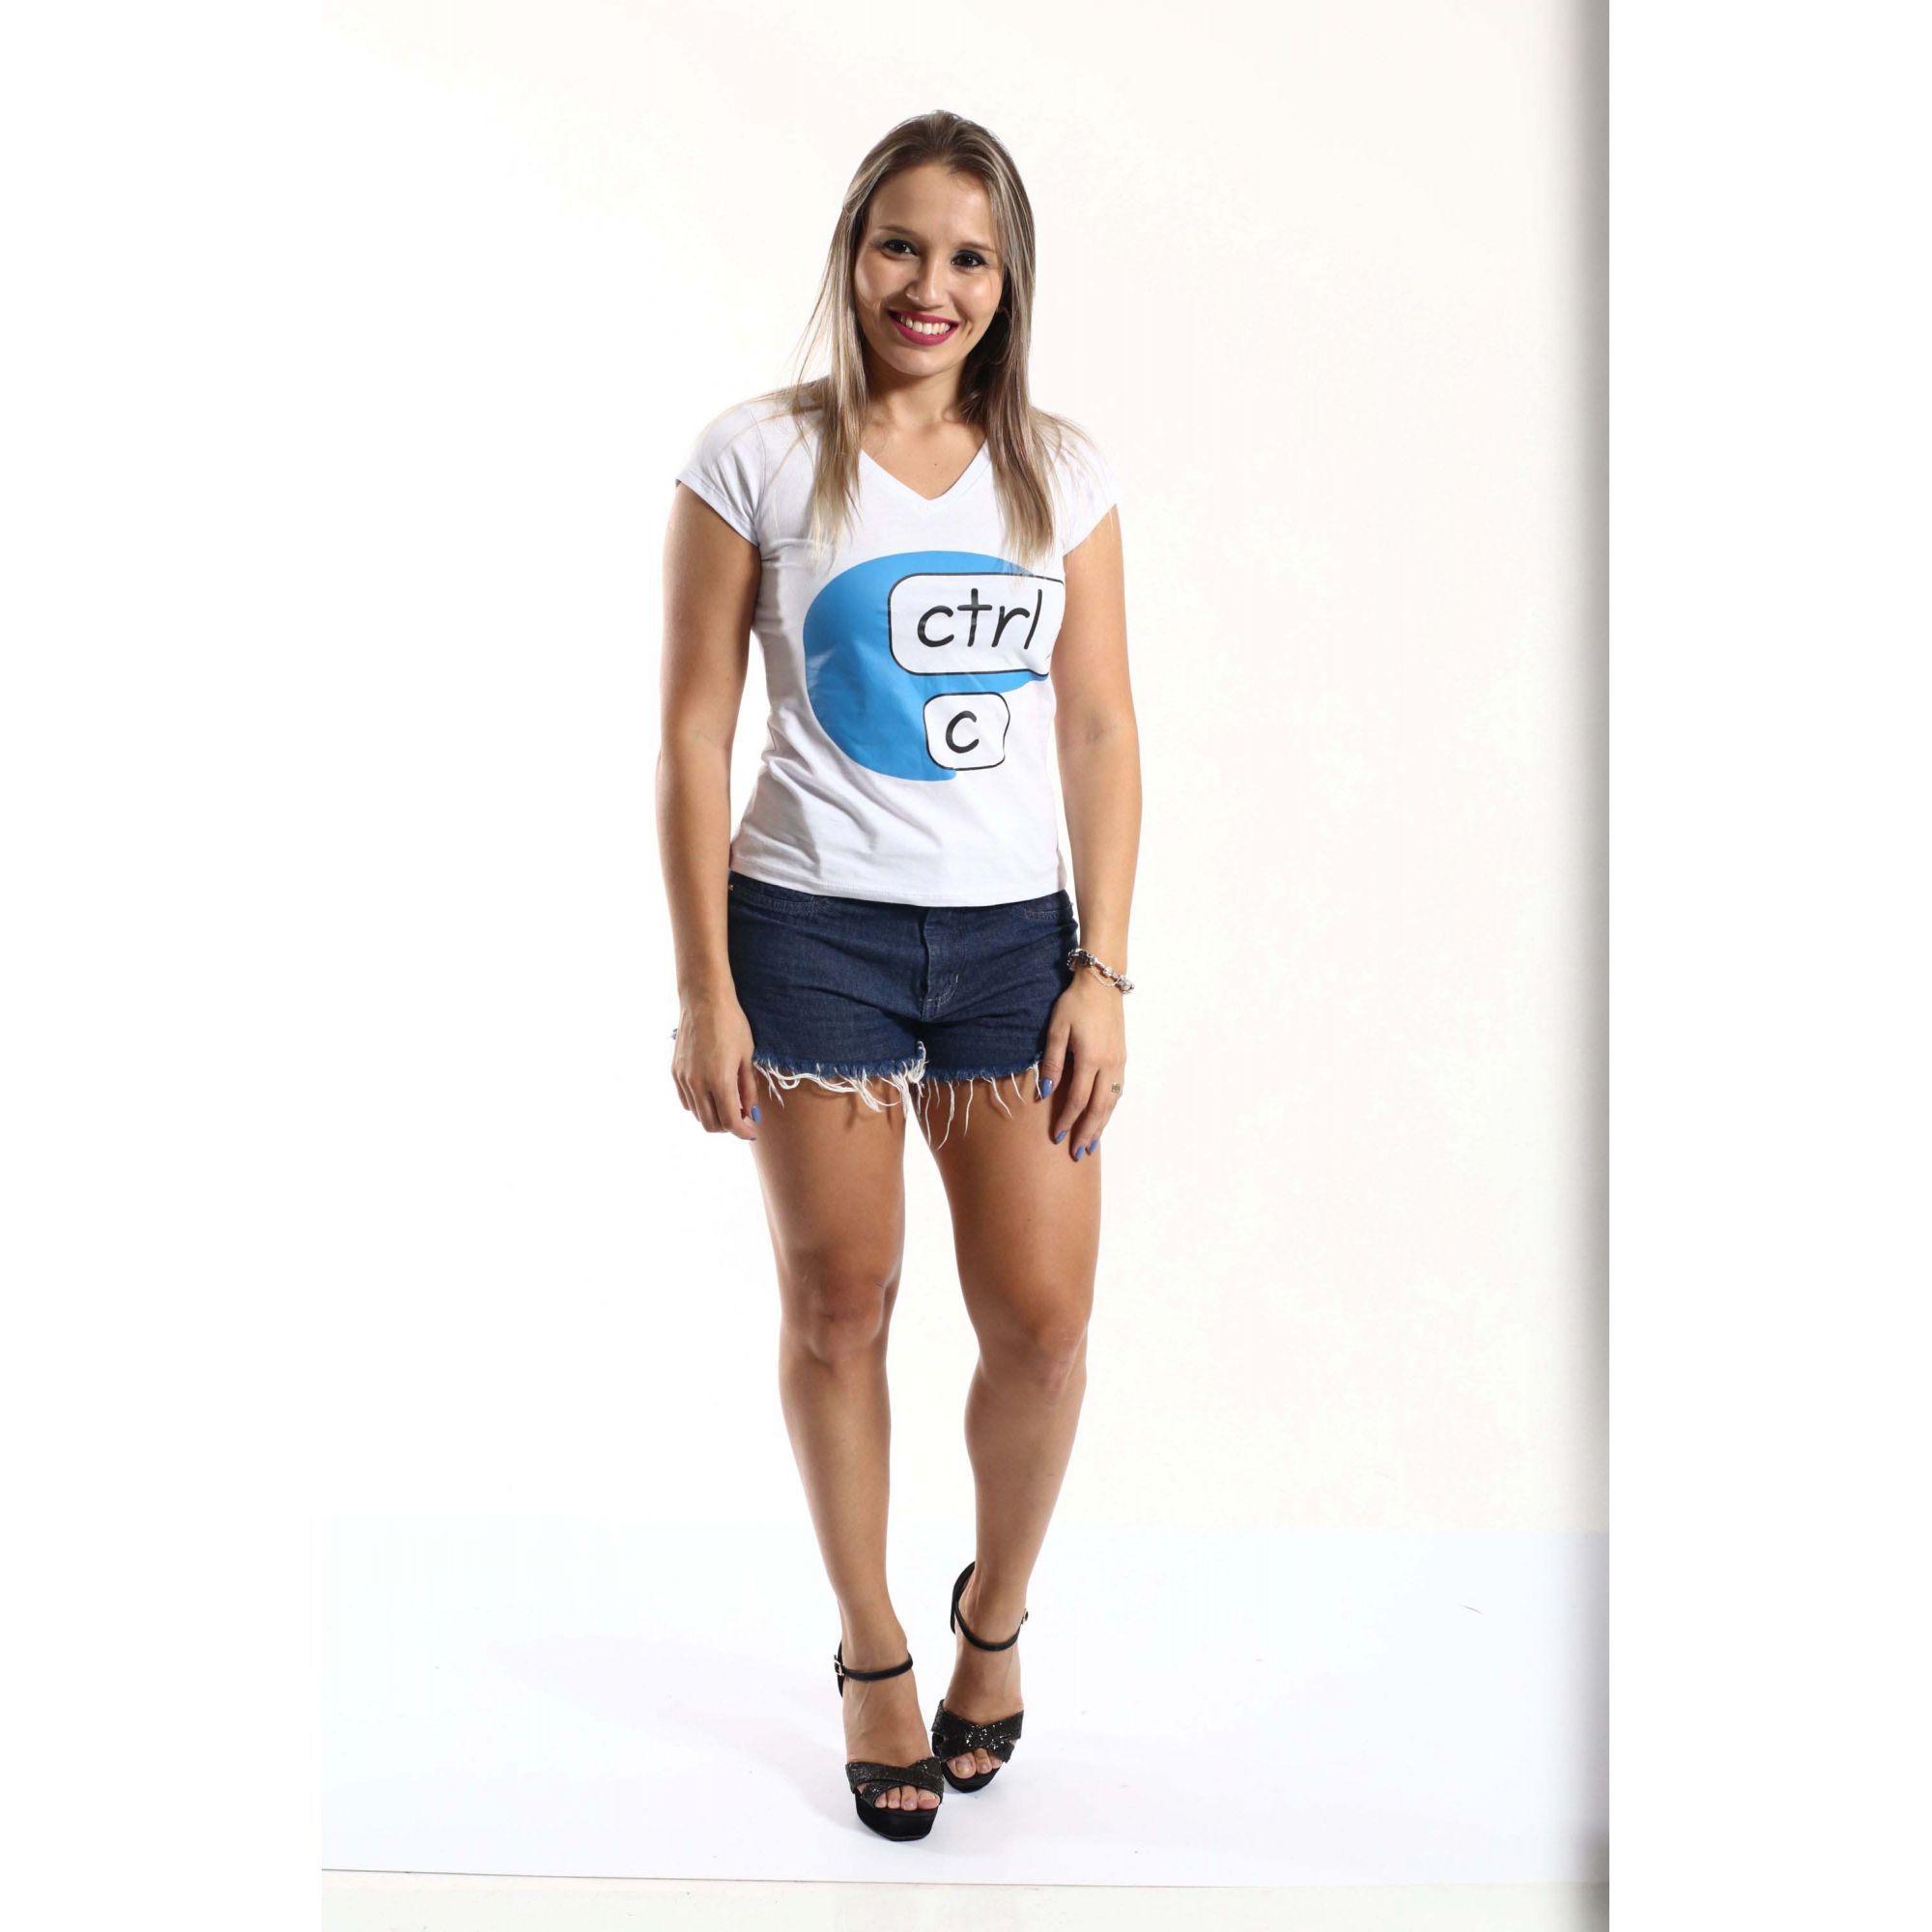 MÃE E FILHO > Kit Camisetas CTRL-C e CTRL-V [Coleção Tal Mãe Tal Filho]  - Heitor Fashion Brazil